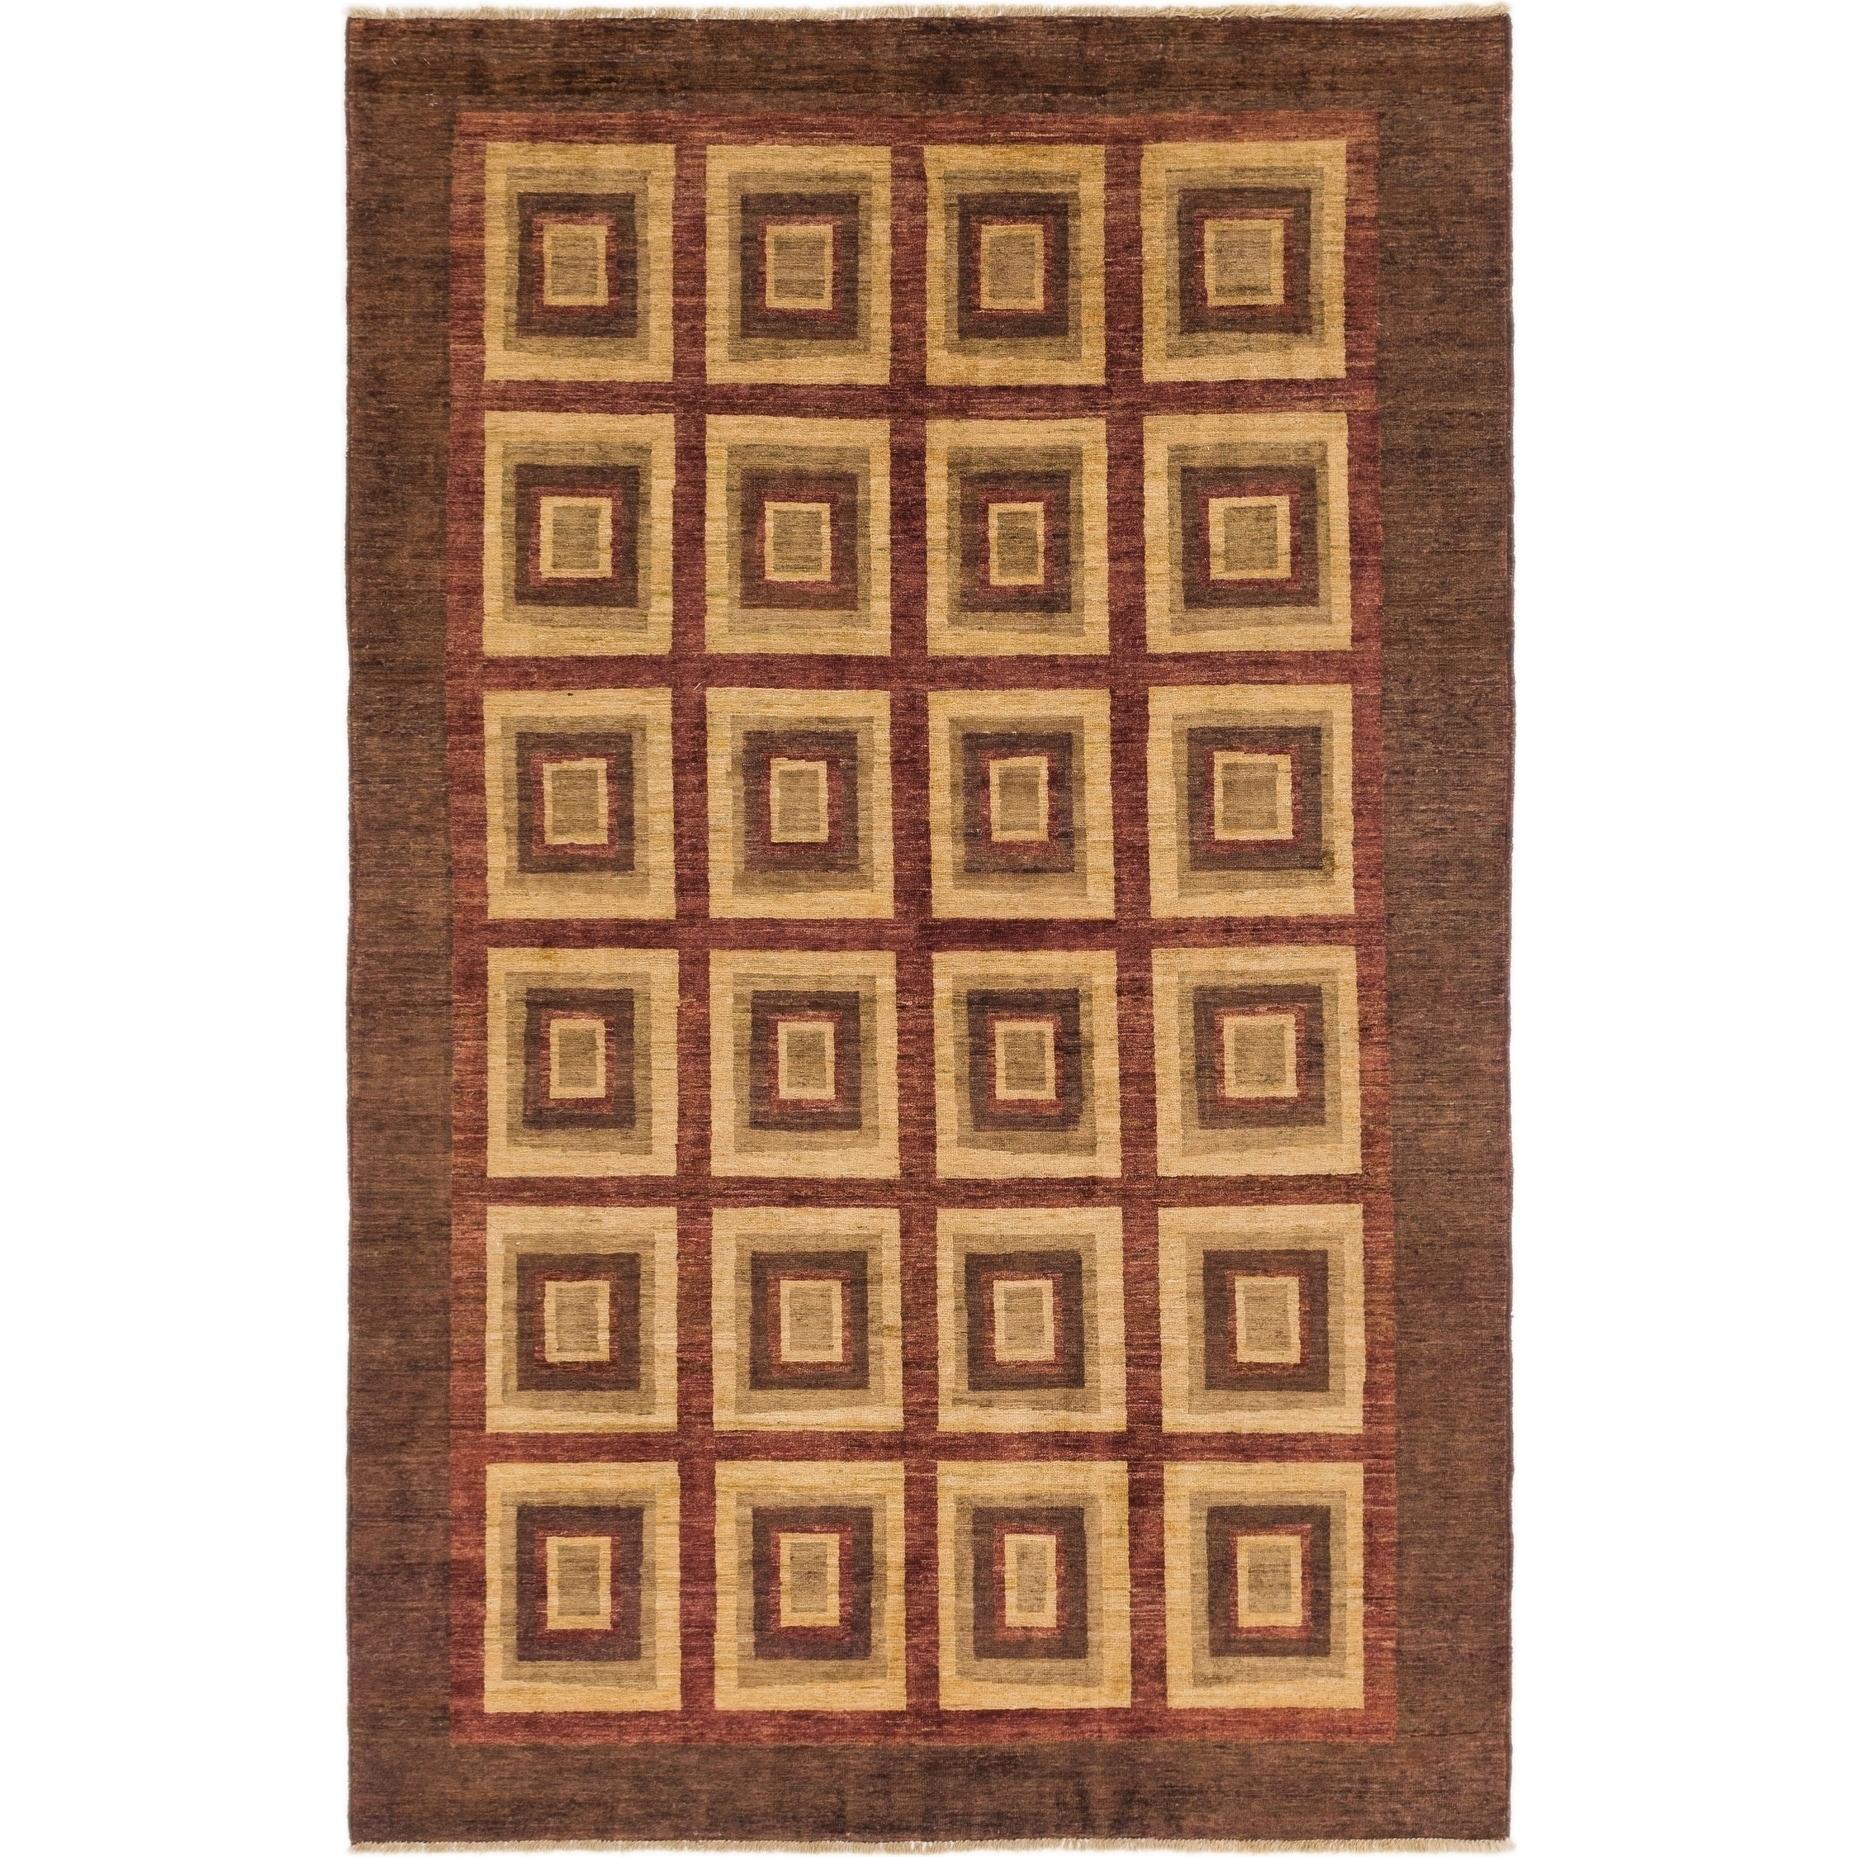 Hand Knotted Kashkuli Gabbeh Wool Area Rug - 5 6 x 8 9 (Burgundy - 5 6 x 8 9)